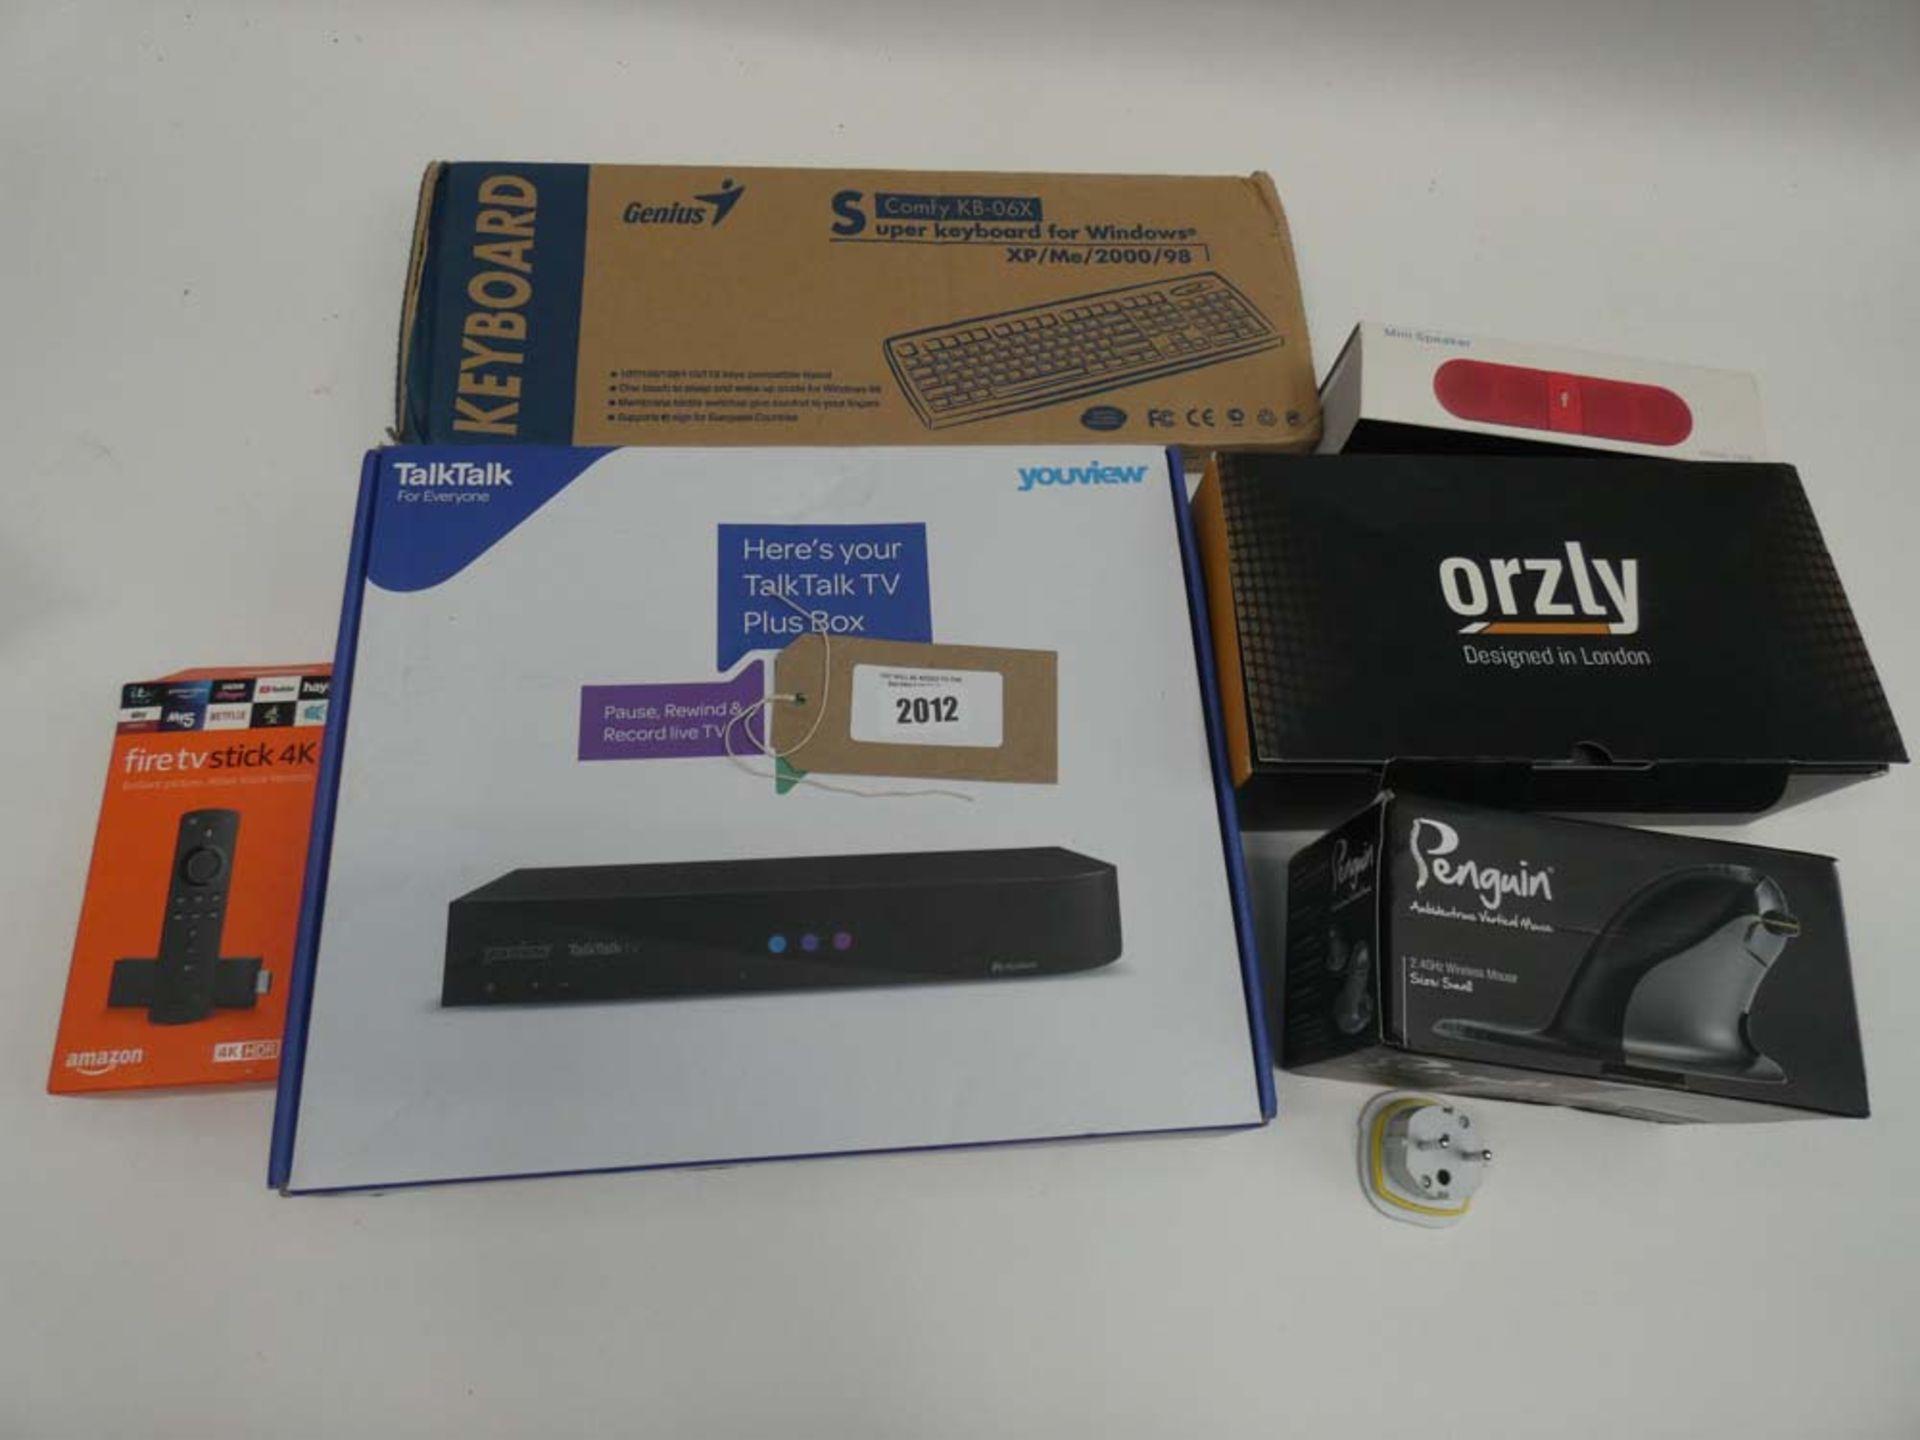 Lot 2012 - TalkTalk TV plus box, Amazon Fire TV stick, keyboard, Orzly Switch case, wireless speaker and